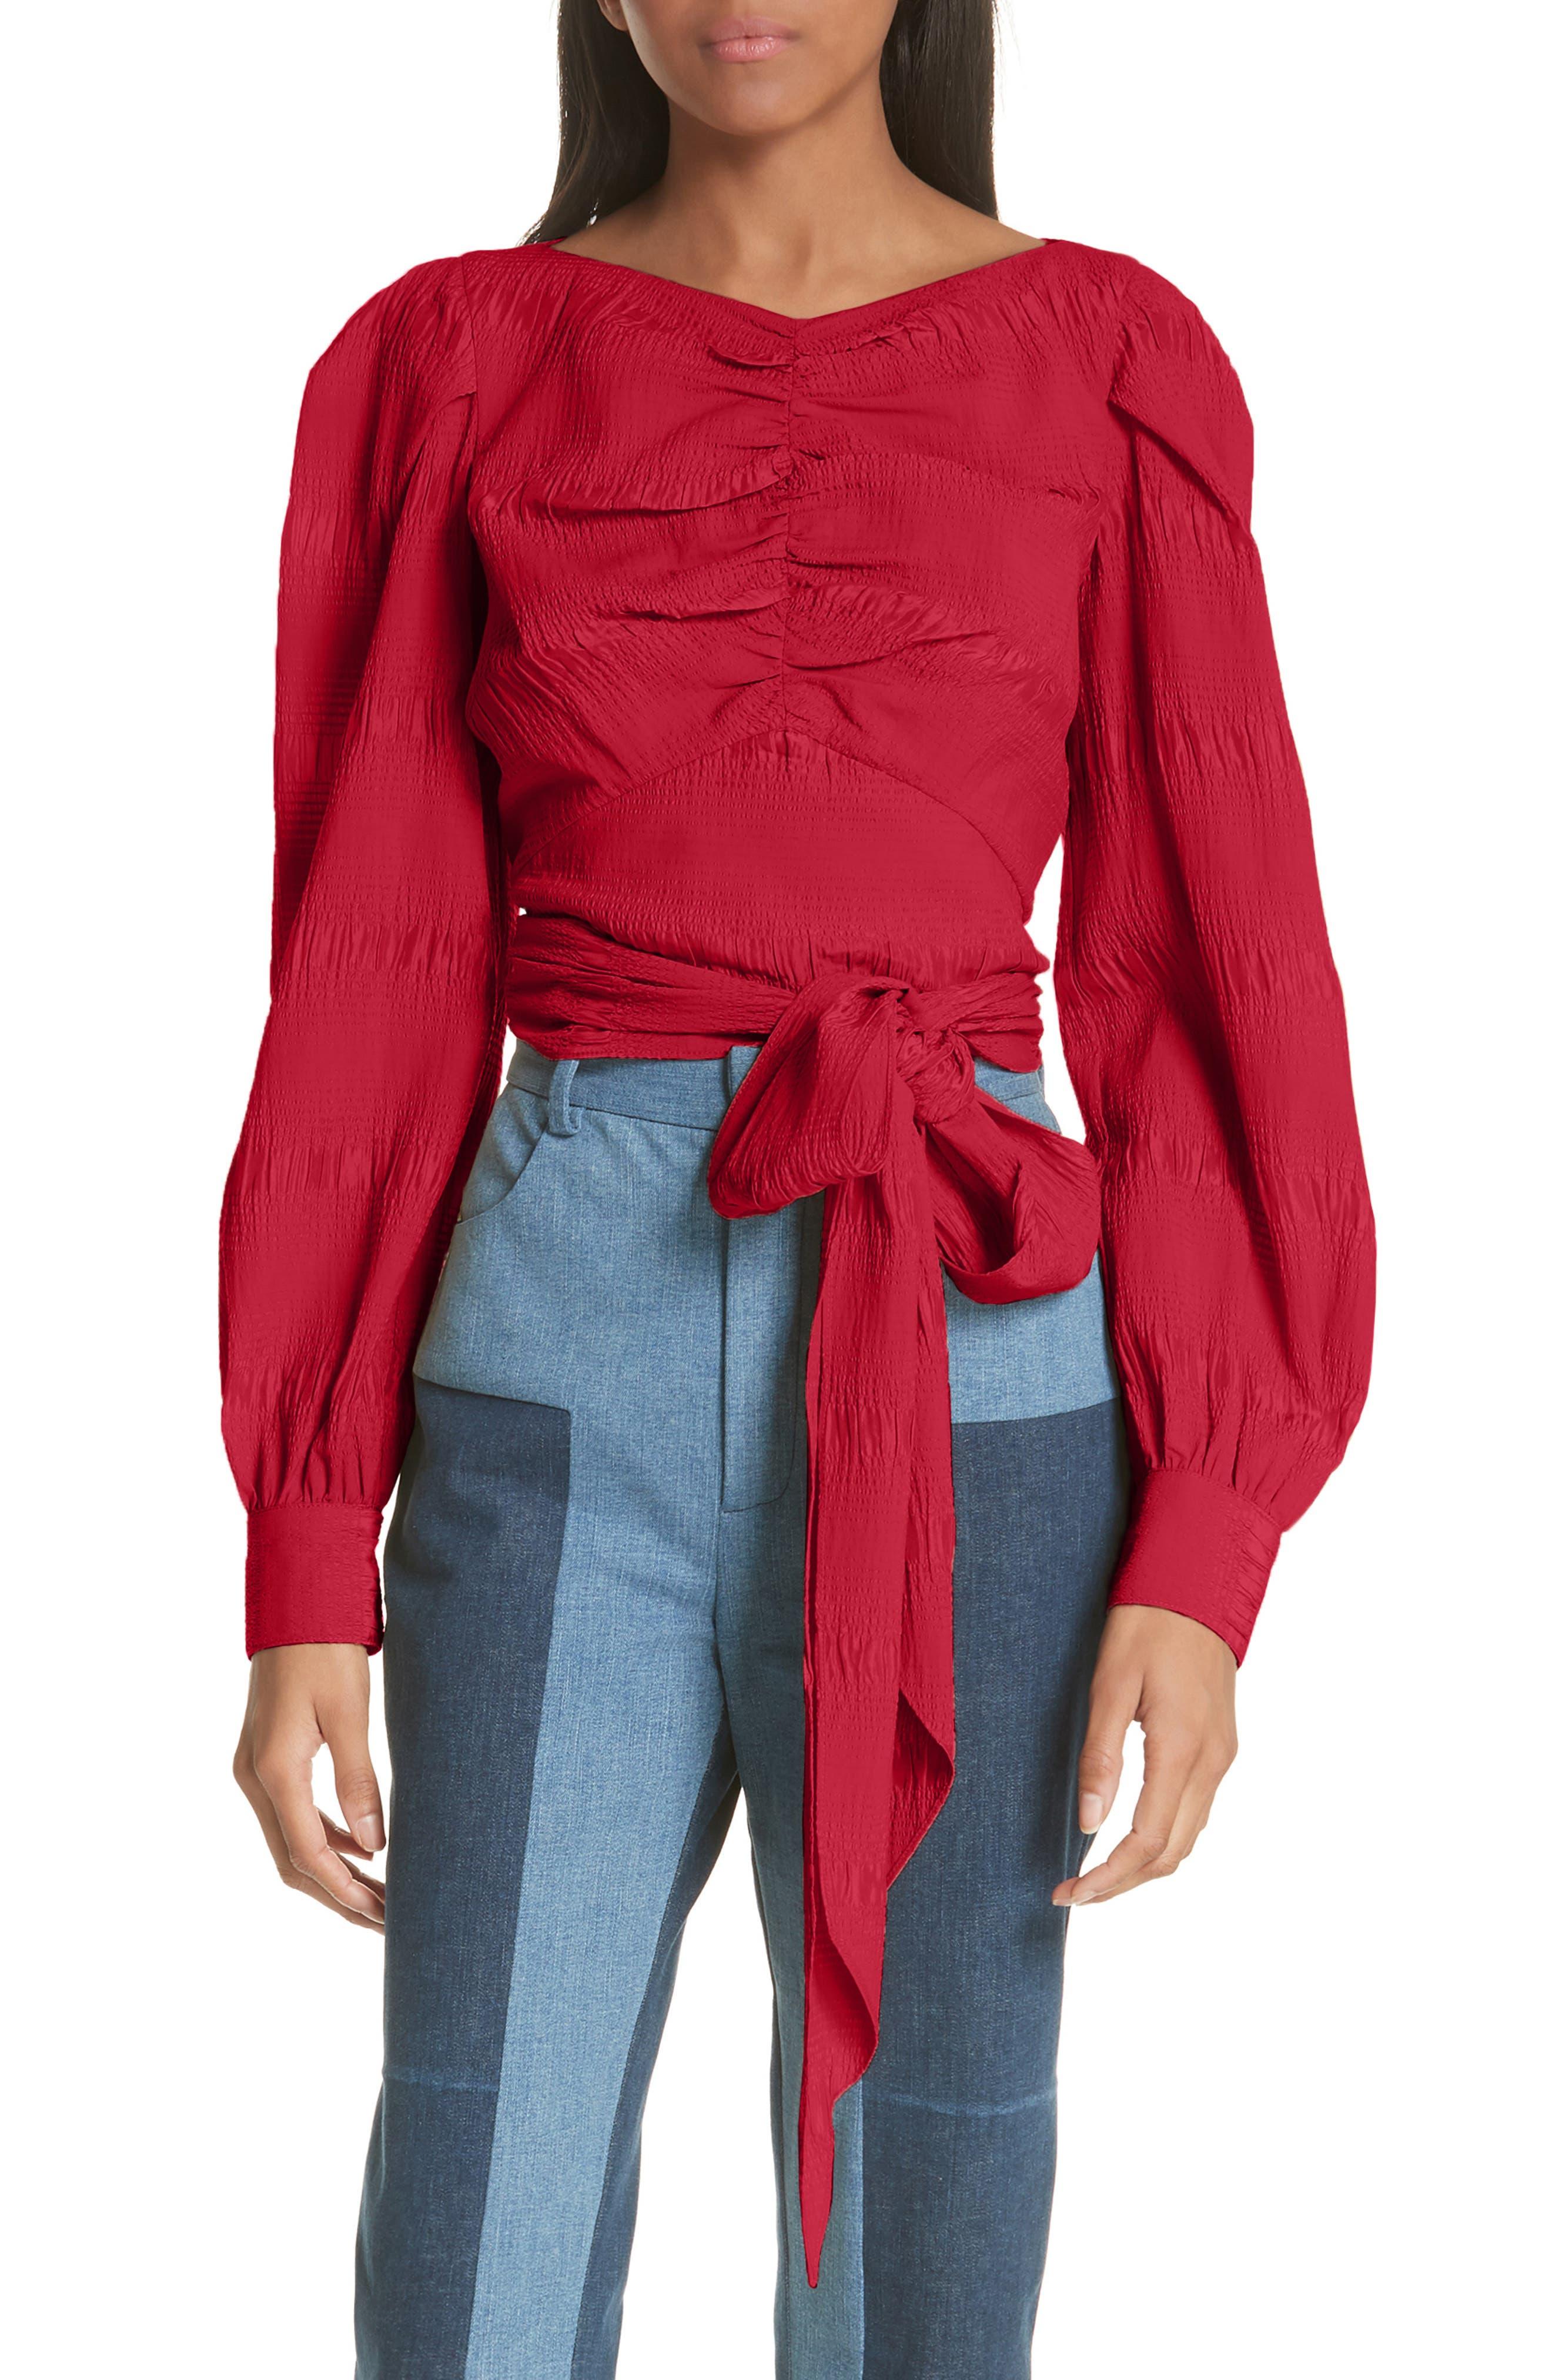 RACHEL COMEY Bounds Tie Waist Silk Blend Top, Main, color, 600